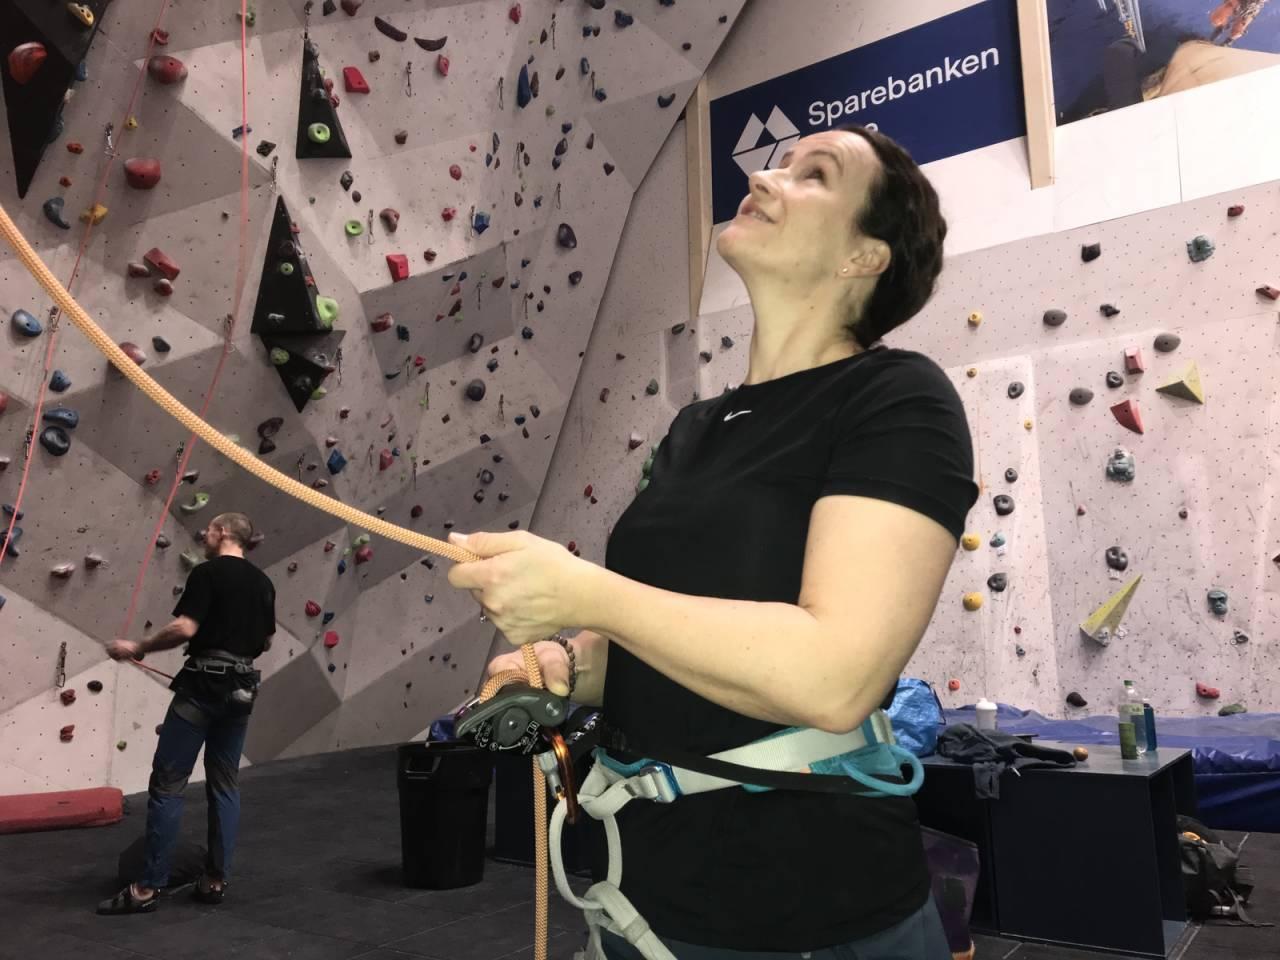 klatring taubrems sikkerhet